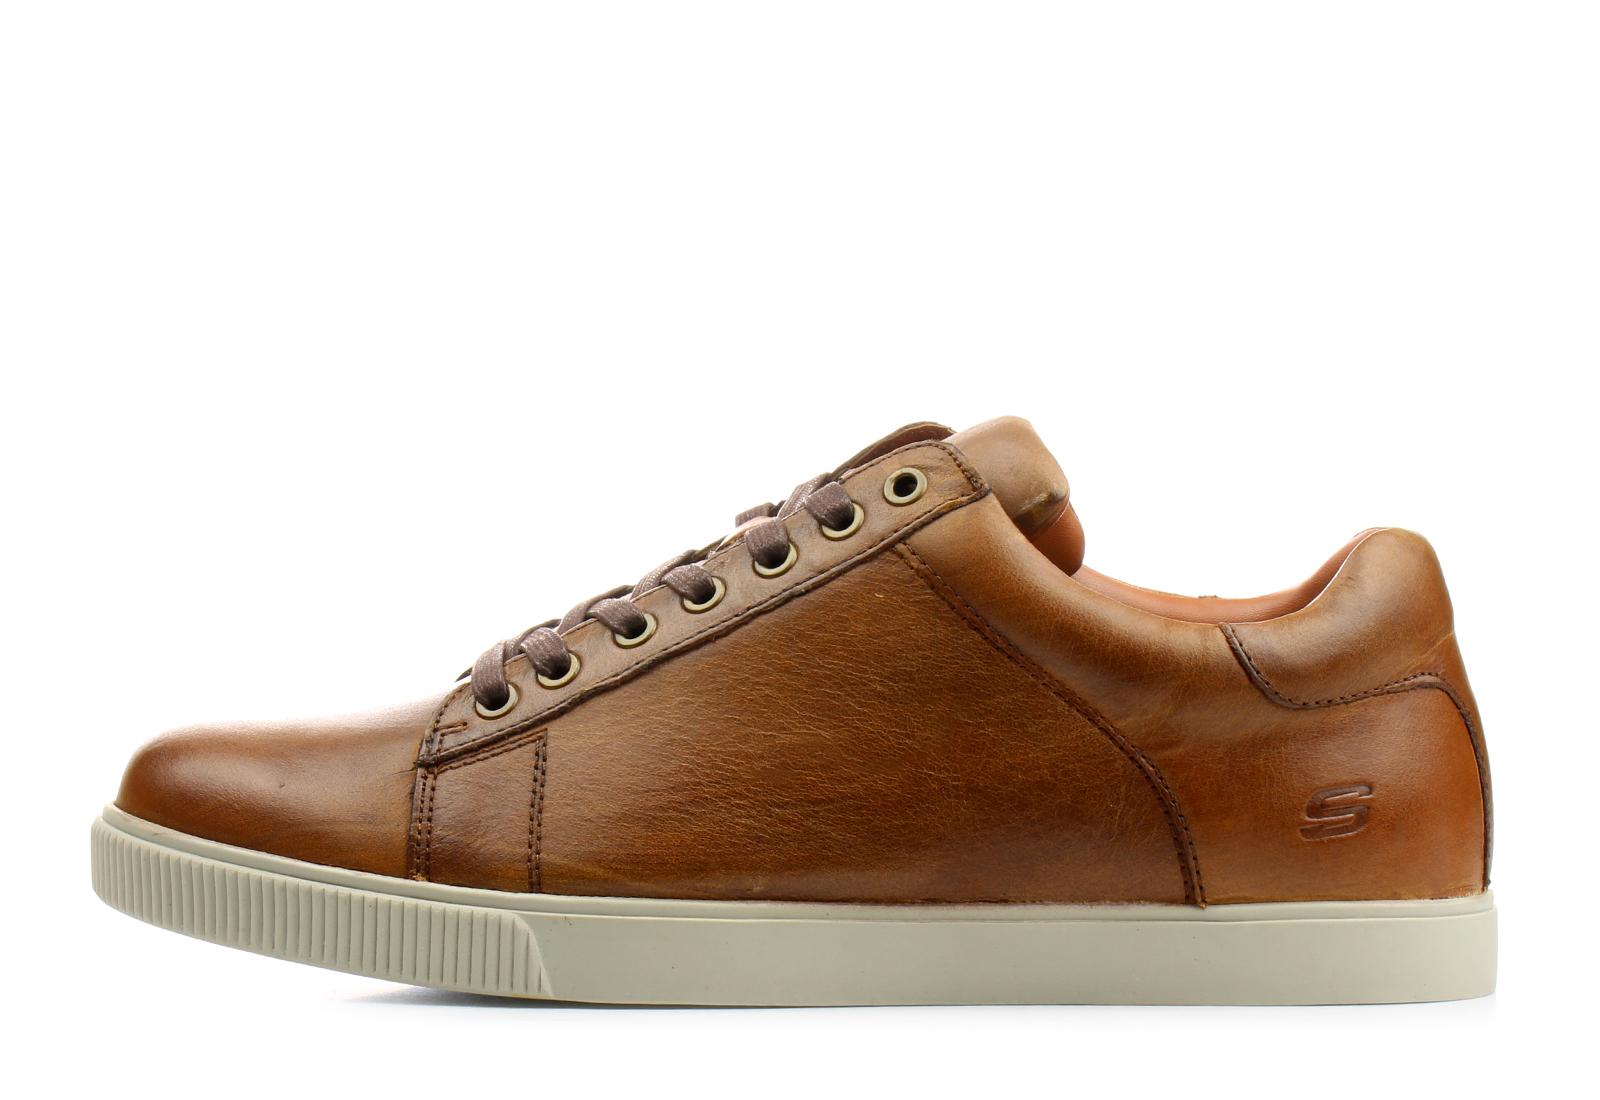 Shop For Skechers Volden Fandom Tns Online 65323 Shoes SnpAFqpwv